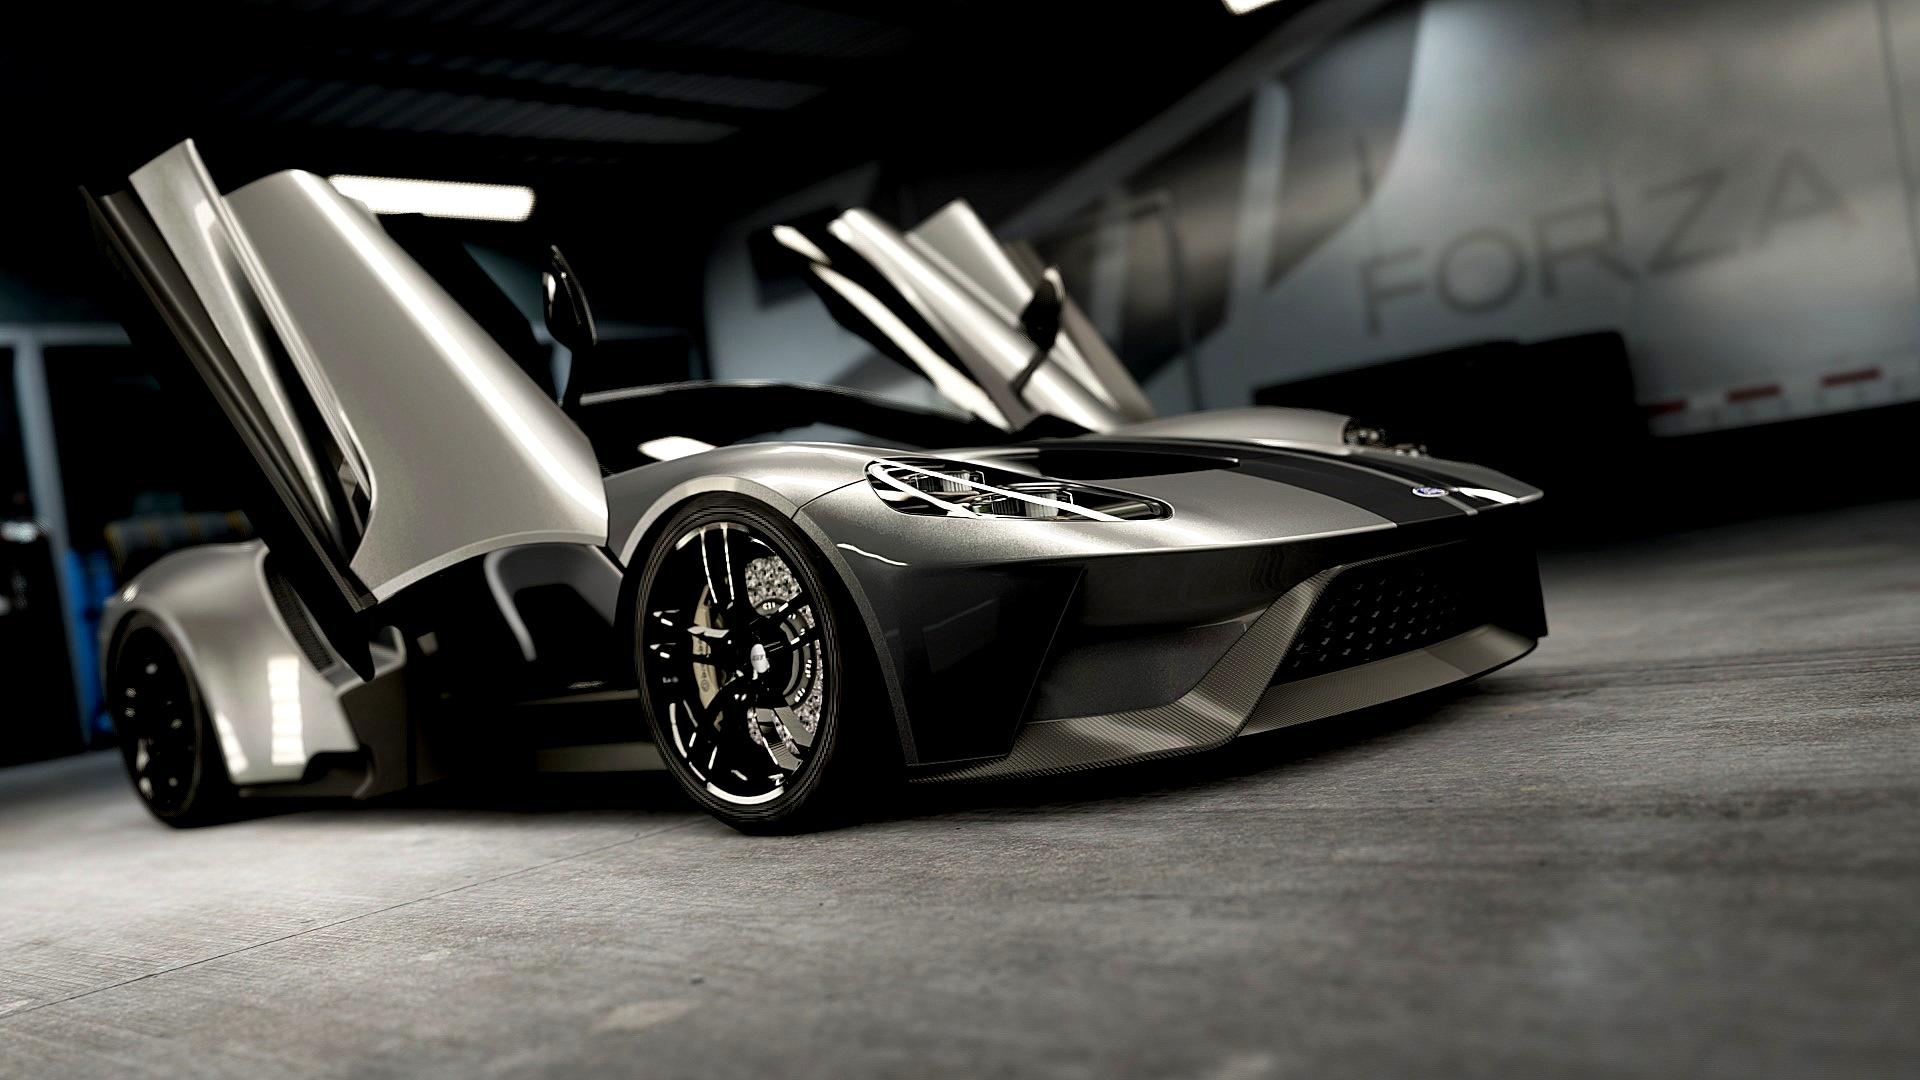 Free Images Wheel Sports Car Supercar Lamborghini Auto Show Concept Car Land Vehicle